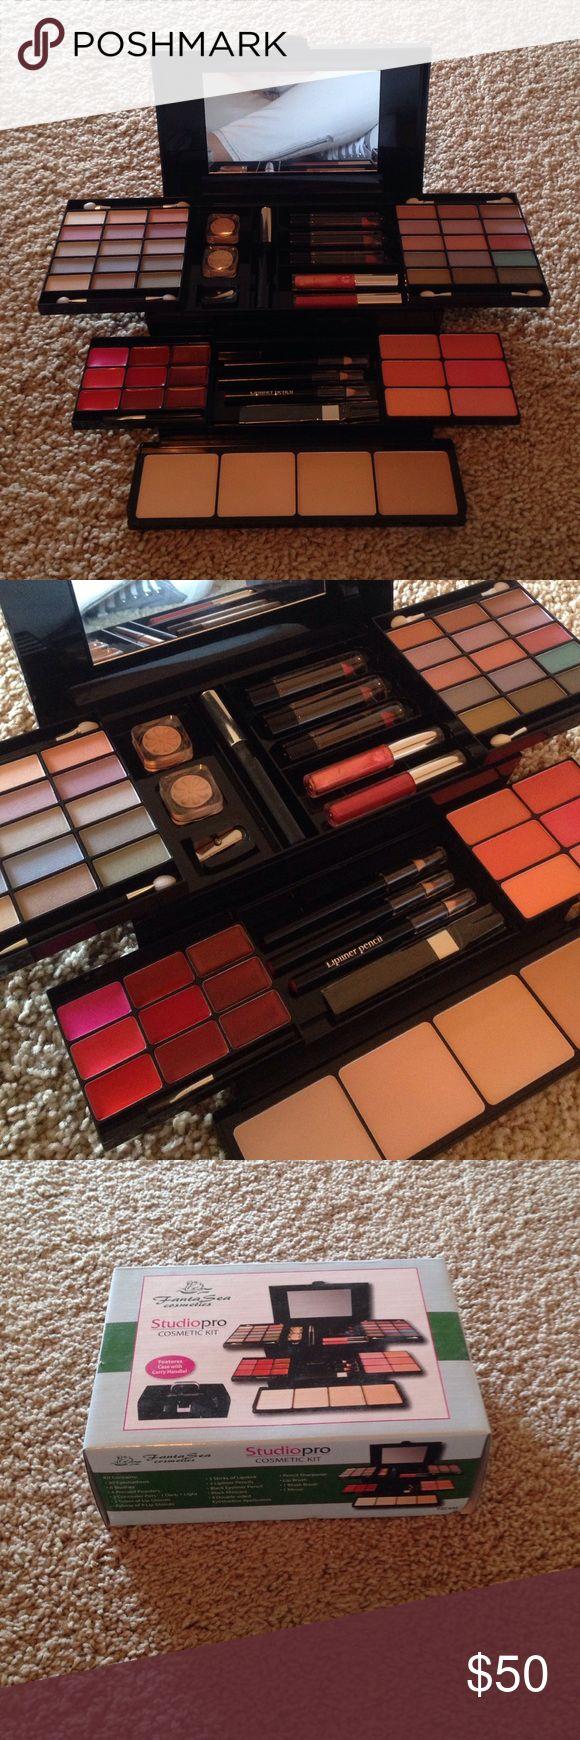 Makeup kit 30 eye shadows 6 blushes 4 powders 2 concealer 2 lip gloss 3 lip stick 2 lip liner eyeliner mascara pencil sharpener mirror.  NIB new in box!!!! Fanta sea Makeup